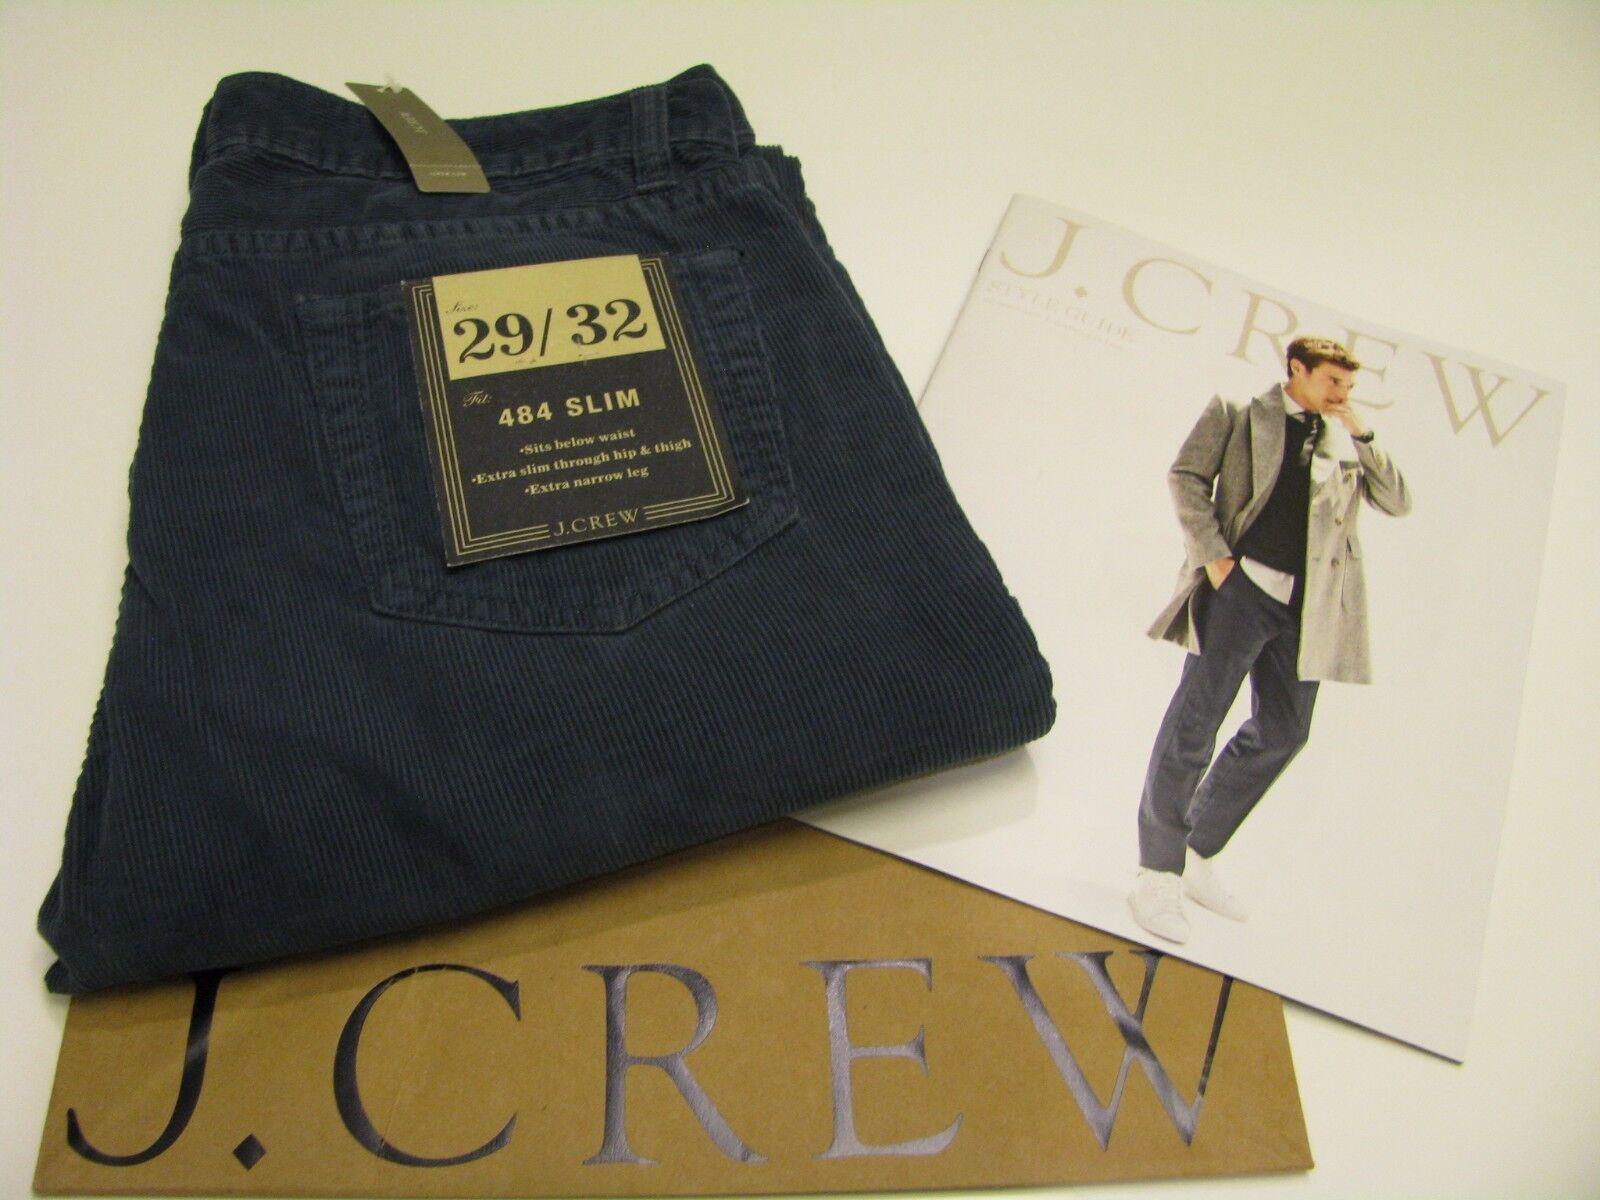 NWT AUTHENTIC J.CREW Men's 484 Slim bluee Corduroy Jean Pant Size 29   32